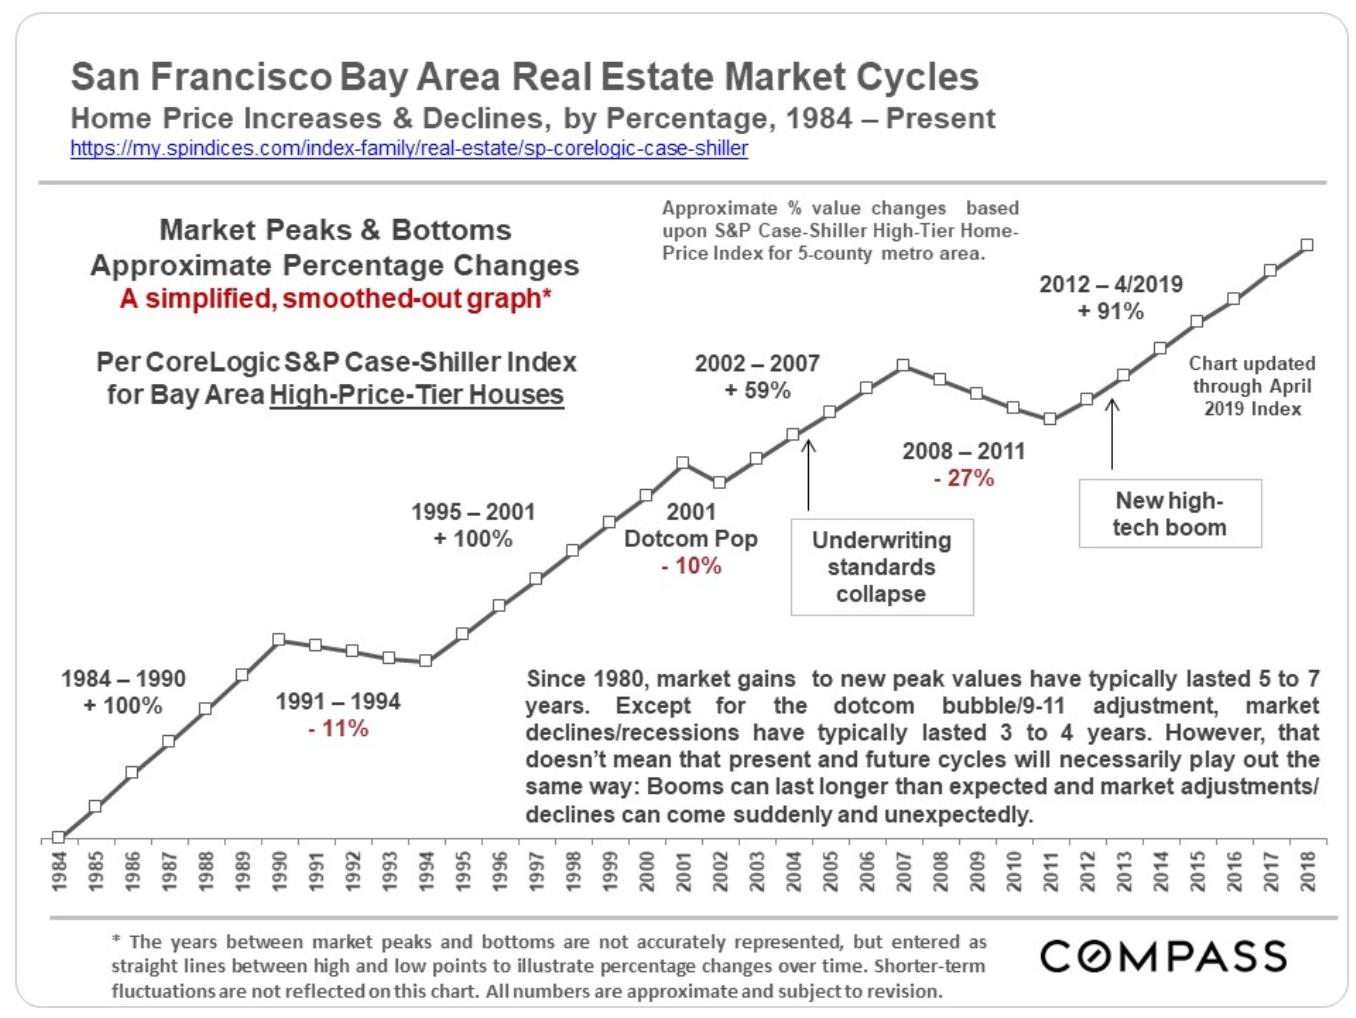 San Francisco Bay Area Real Estate Market Cycles